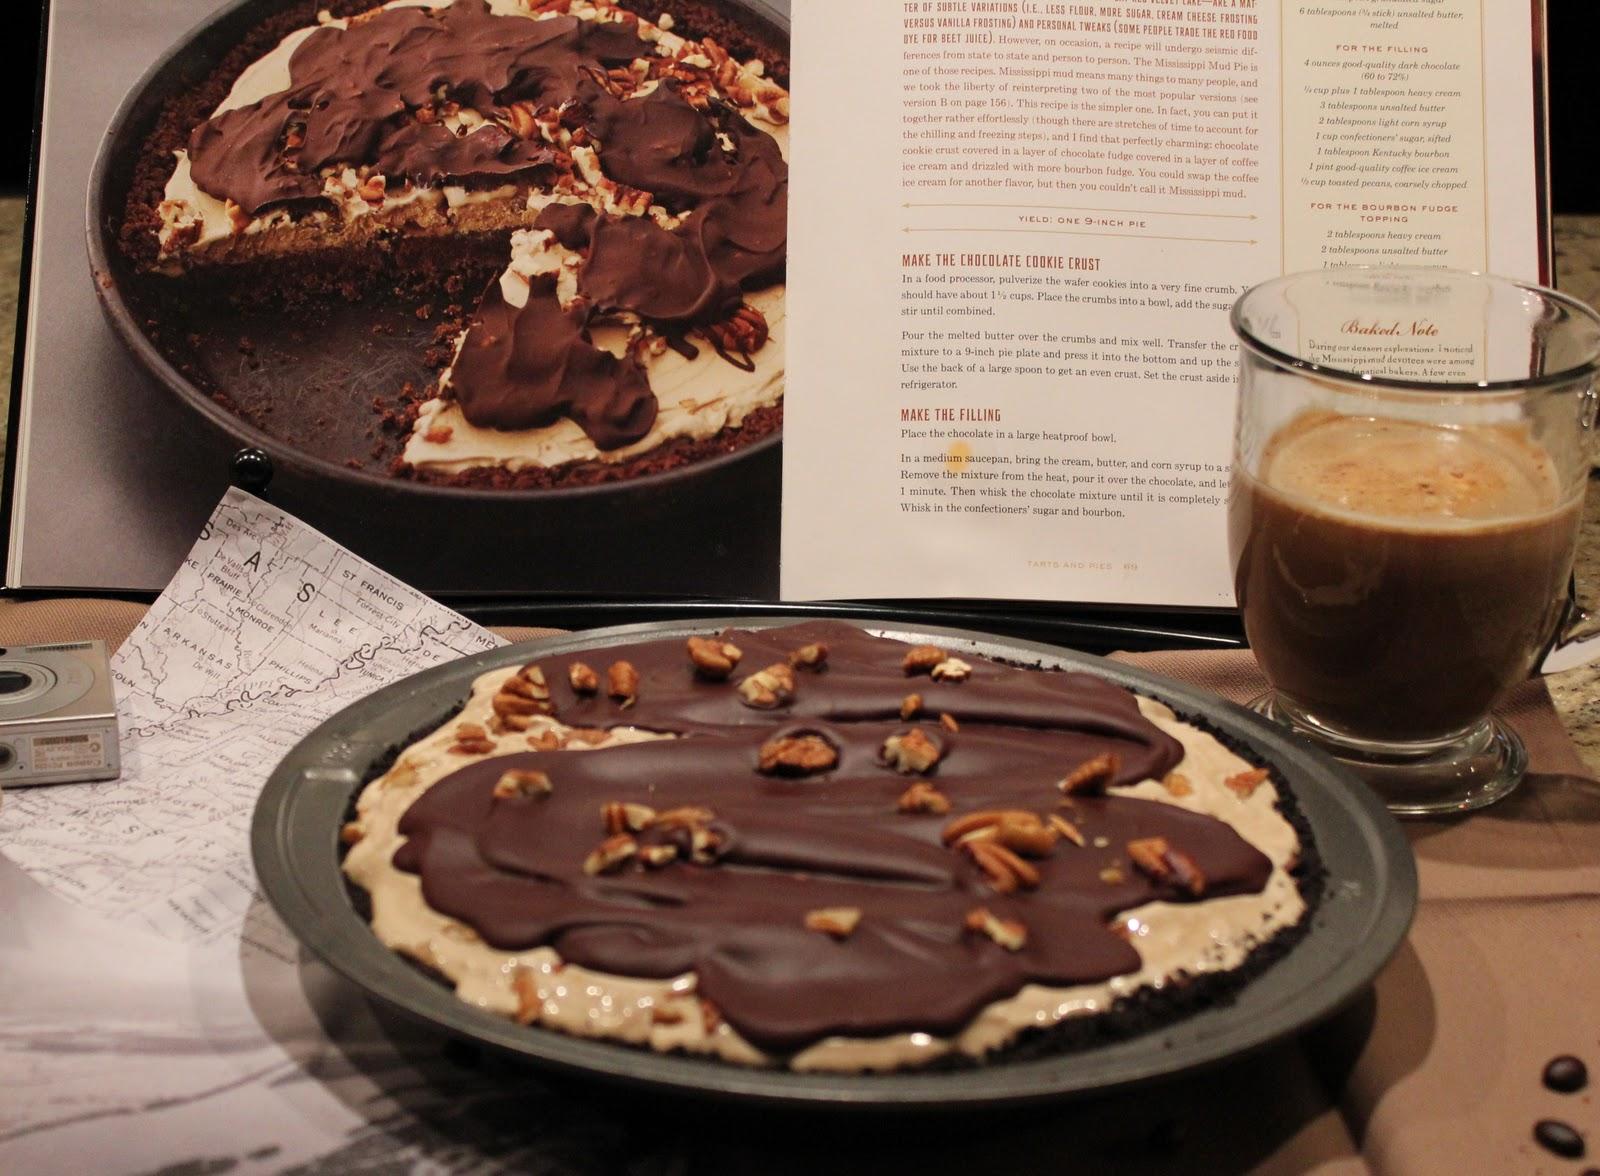 Both Halves: Mississippi Mud Pie (A) AKA Coffee Ice Cream Tart